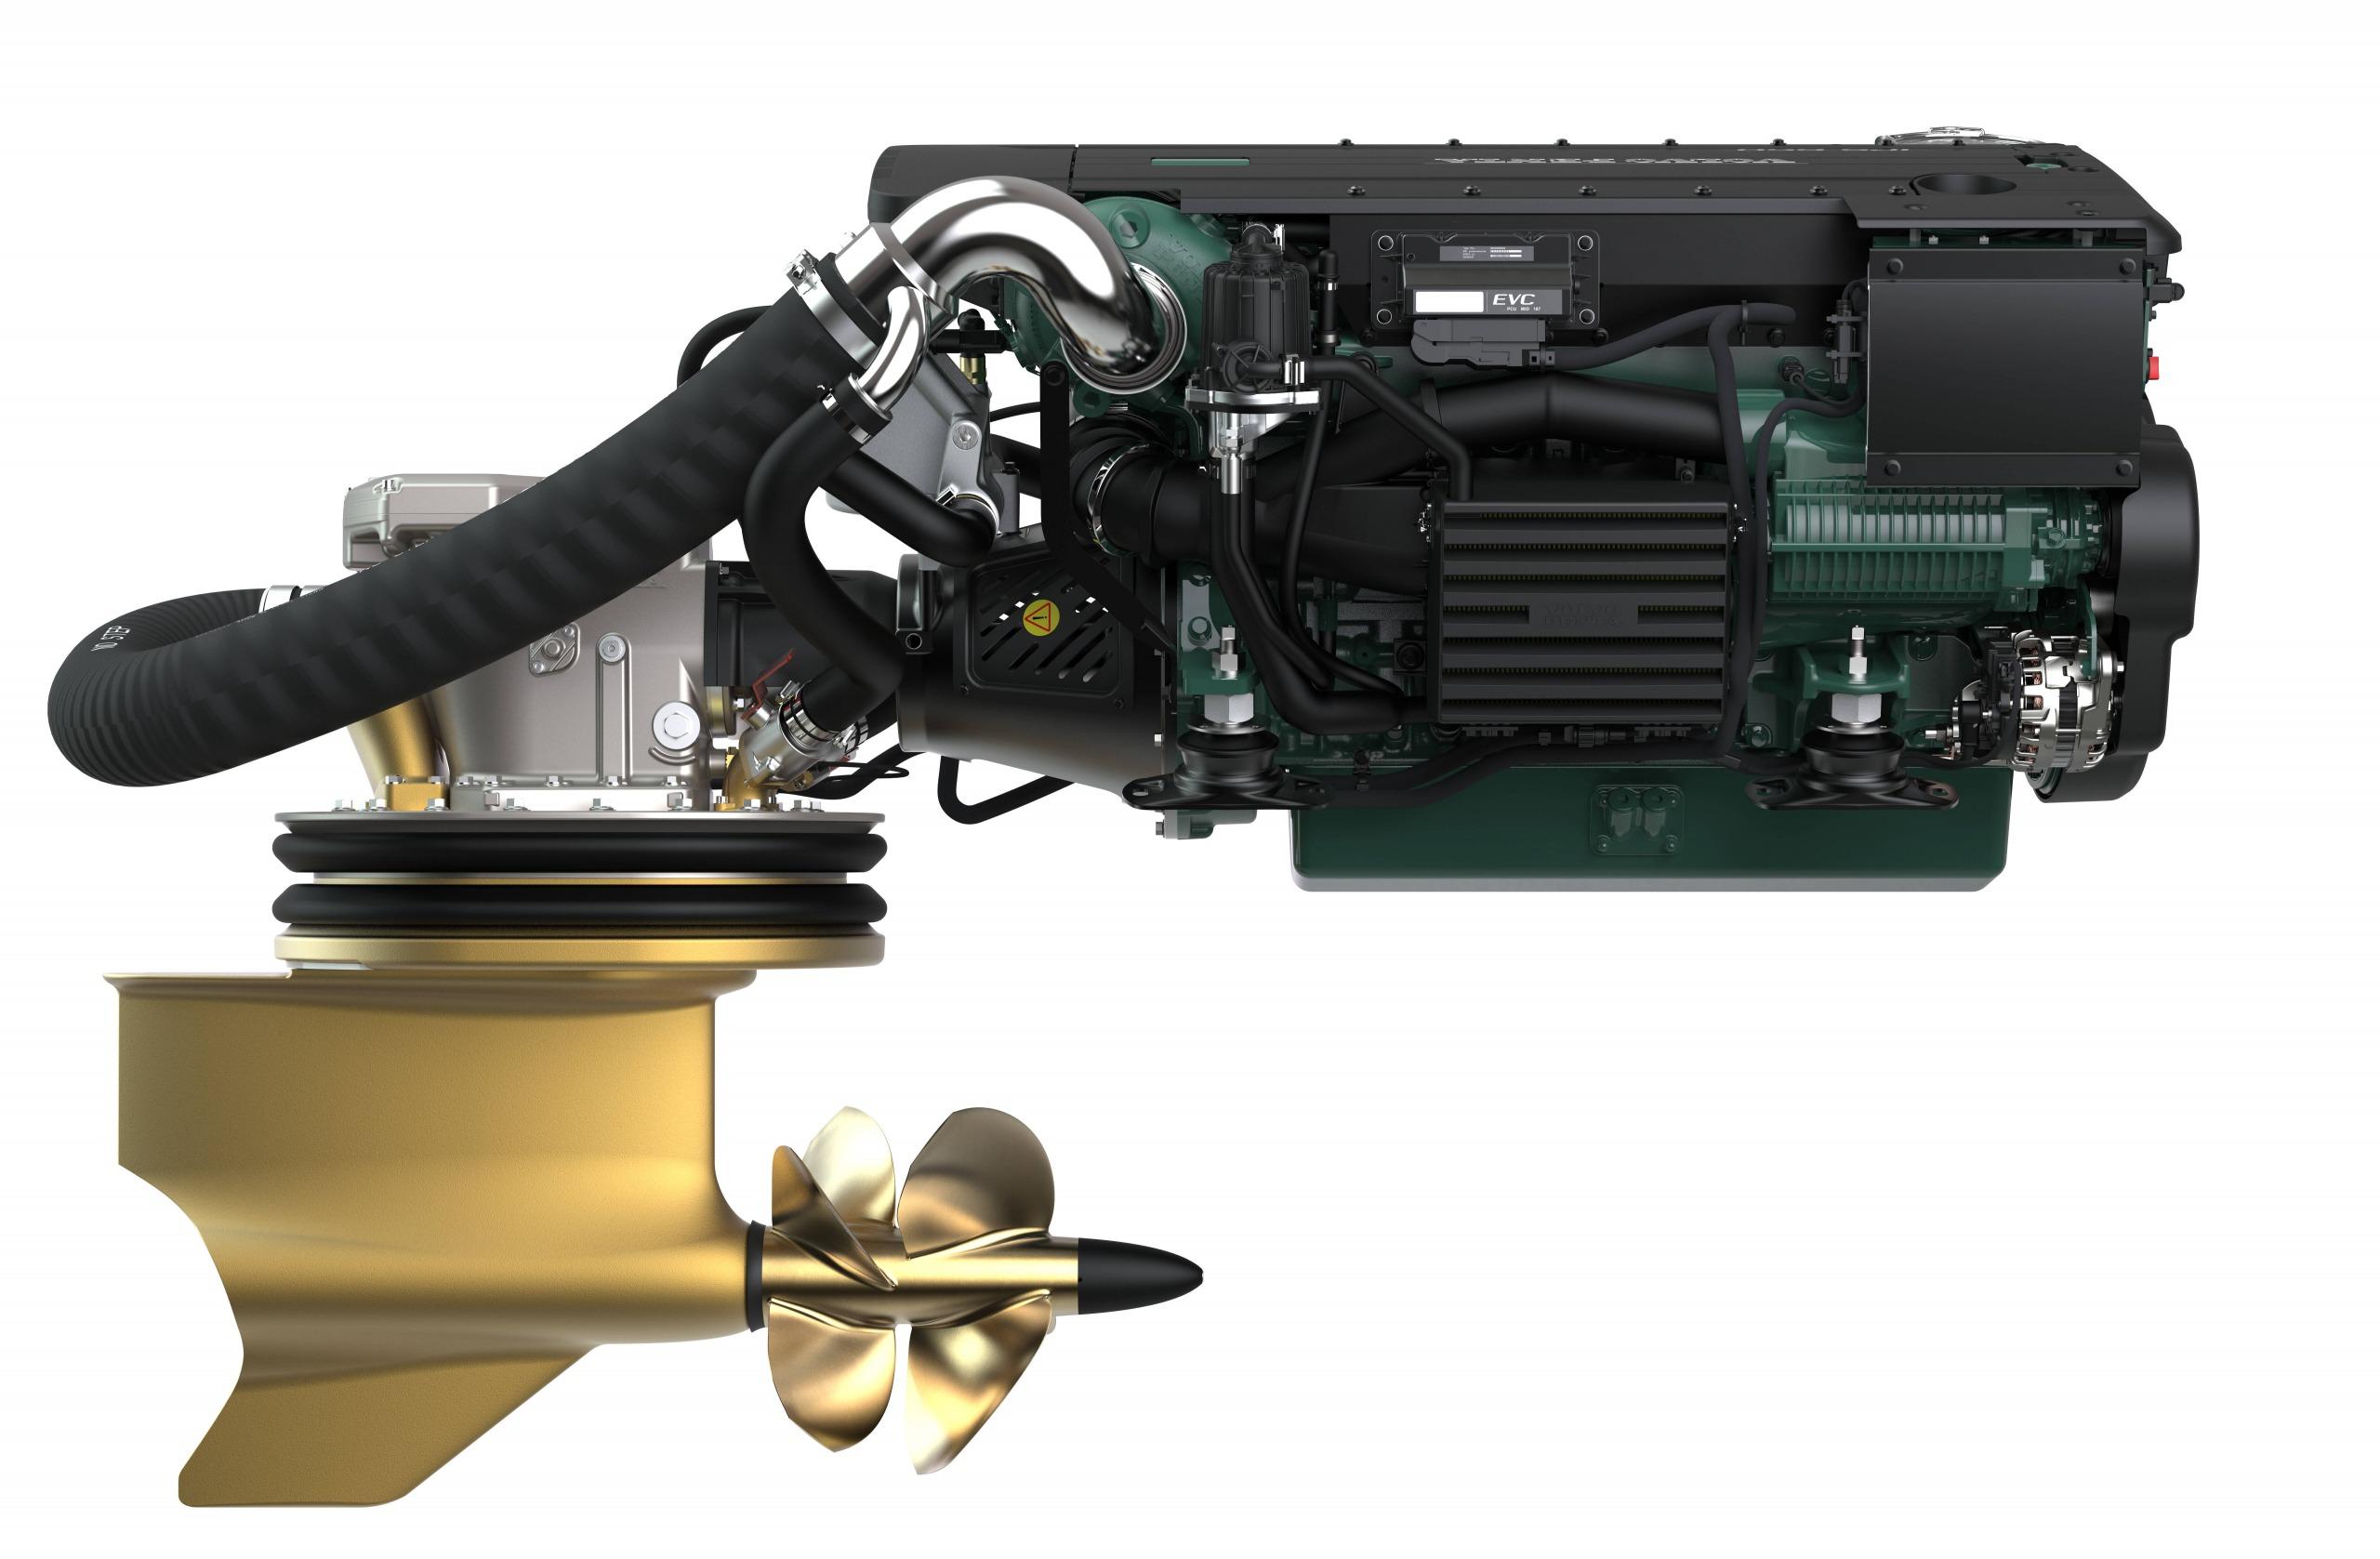 Squadron 50 | Дизельные двигатели Volvo Penta c колонками IPS